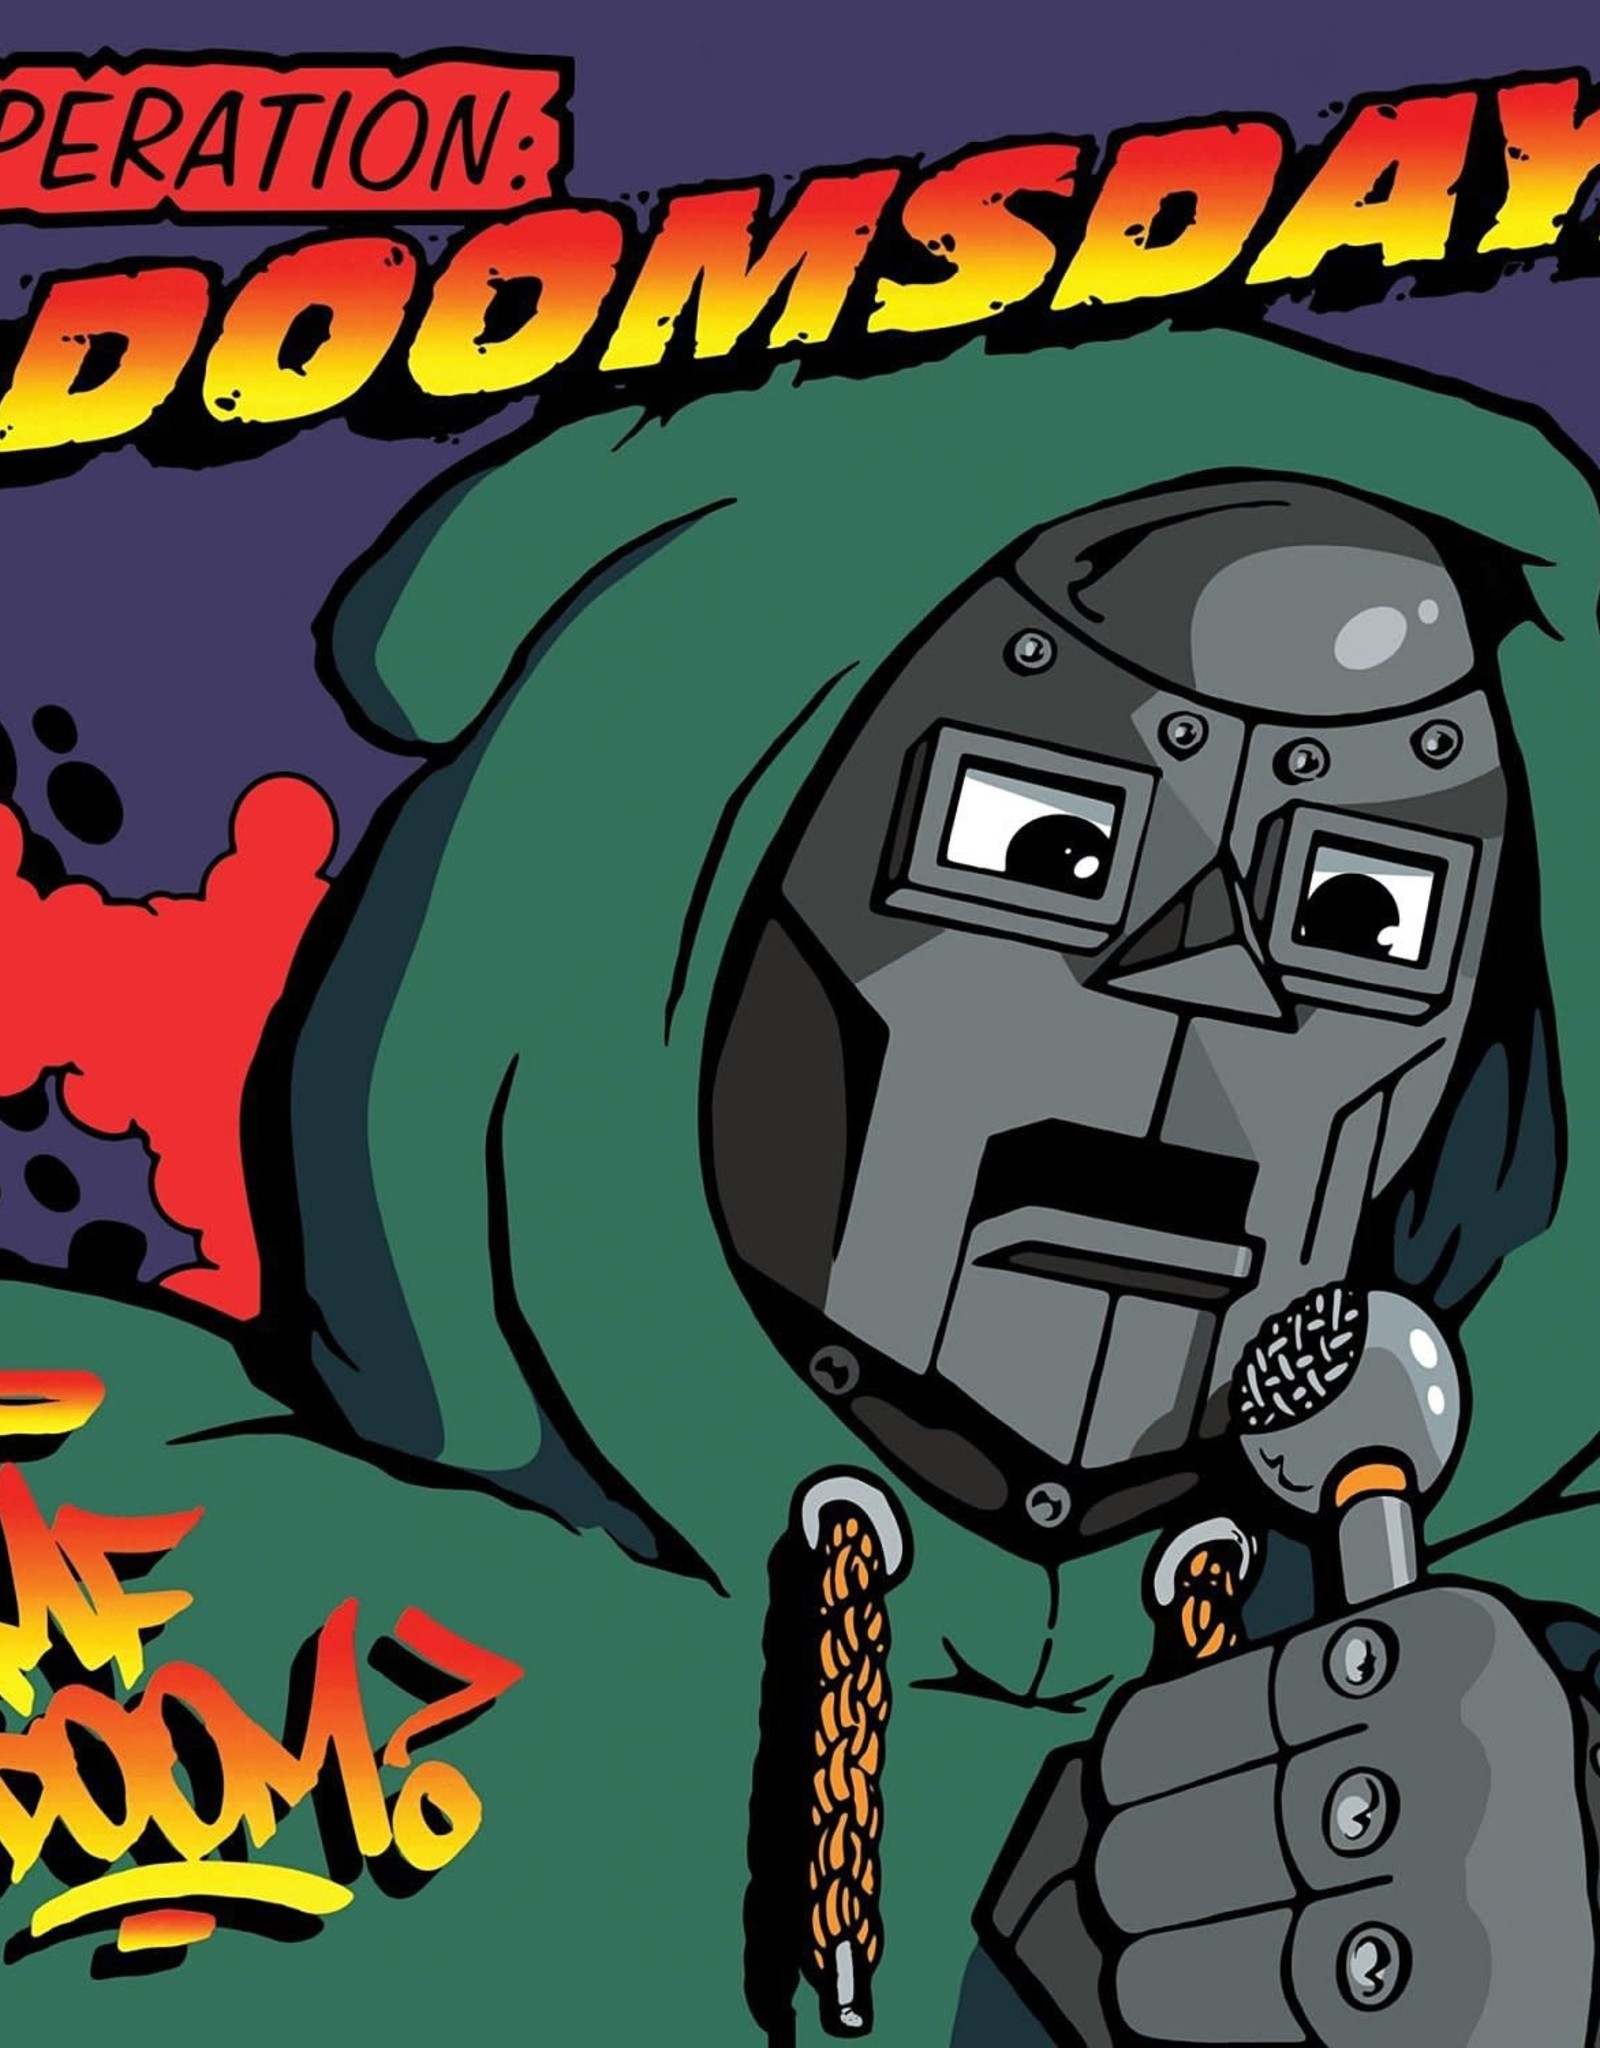 Mf Doom - Operation: Doomsday (Variant 94)